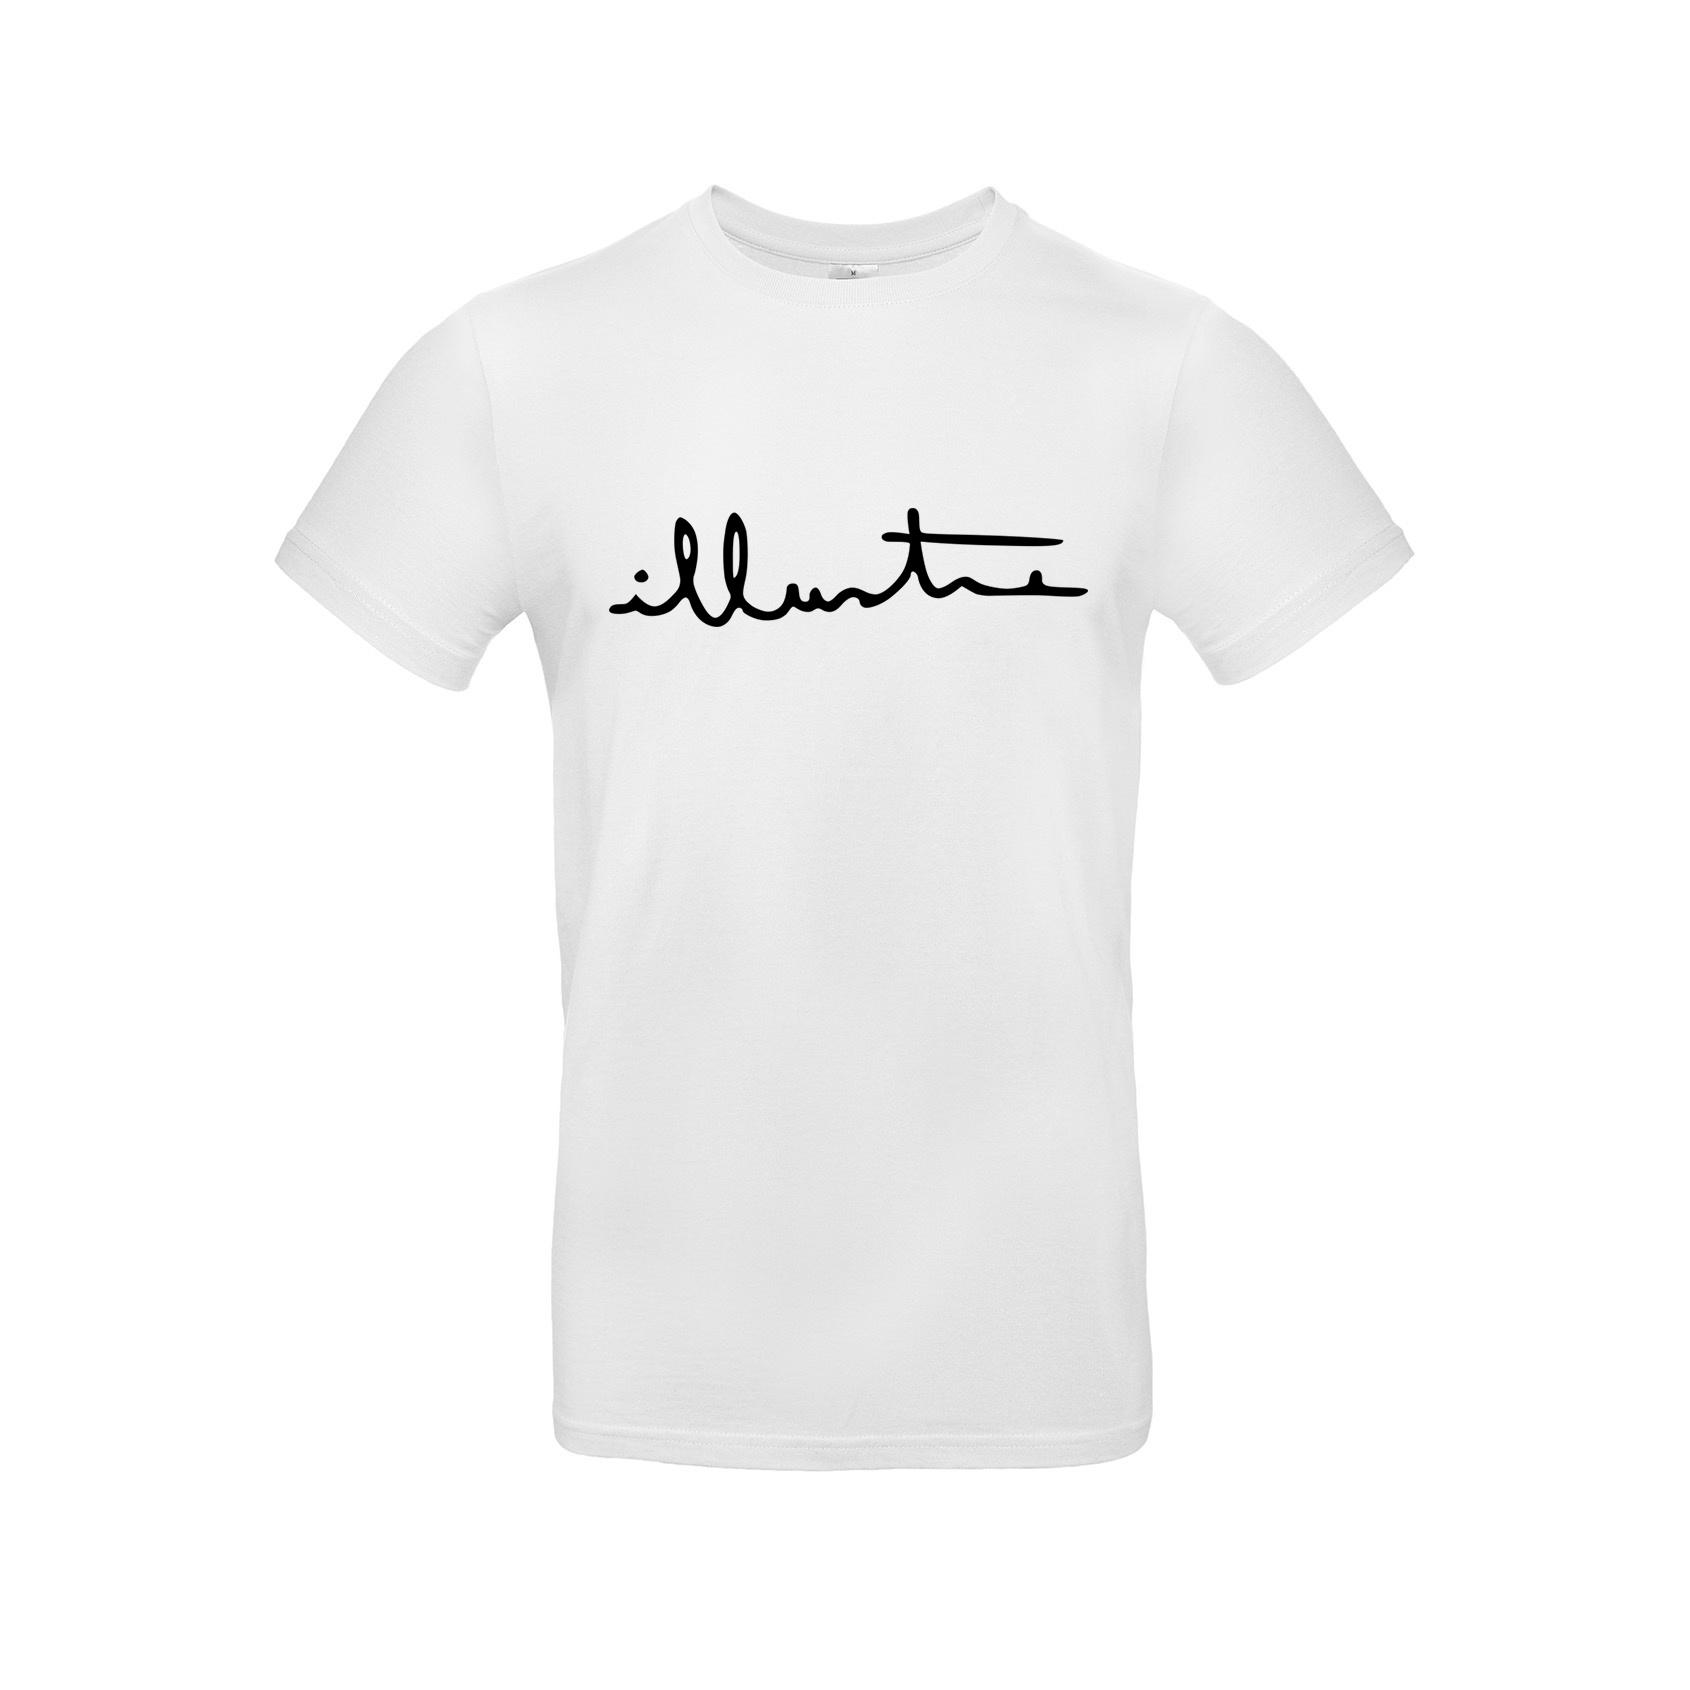 Illustre-t-shirt-blanc-logo-noir